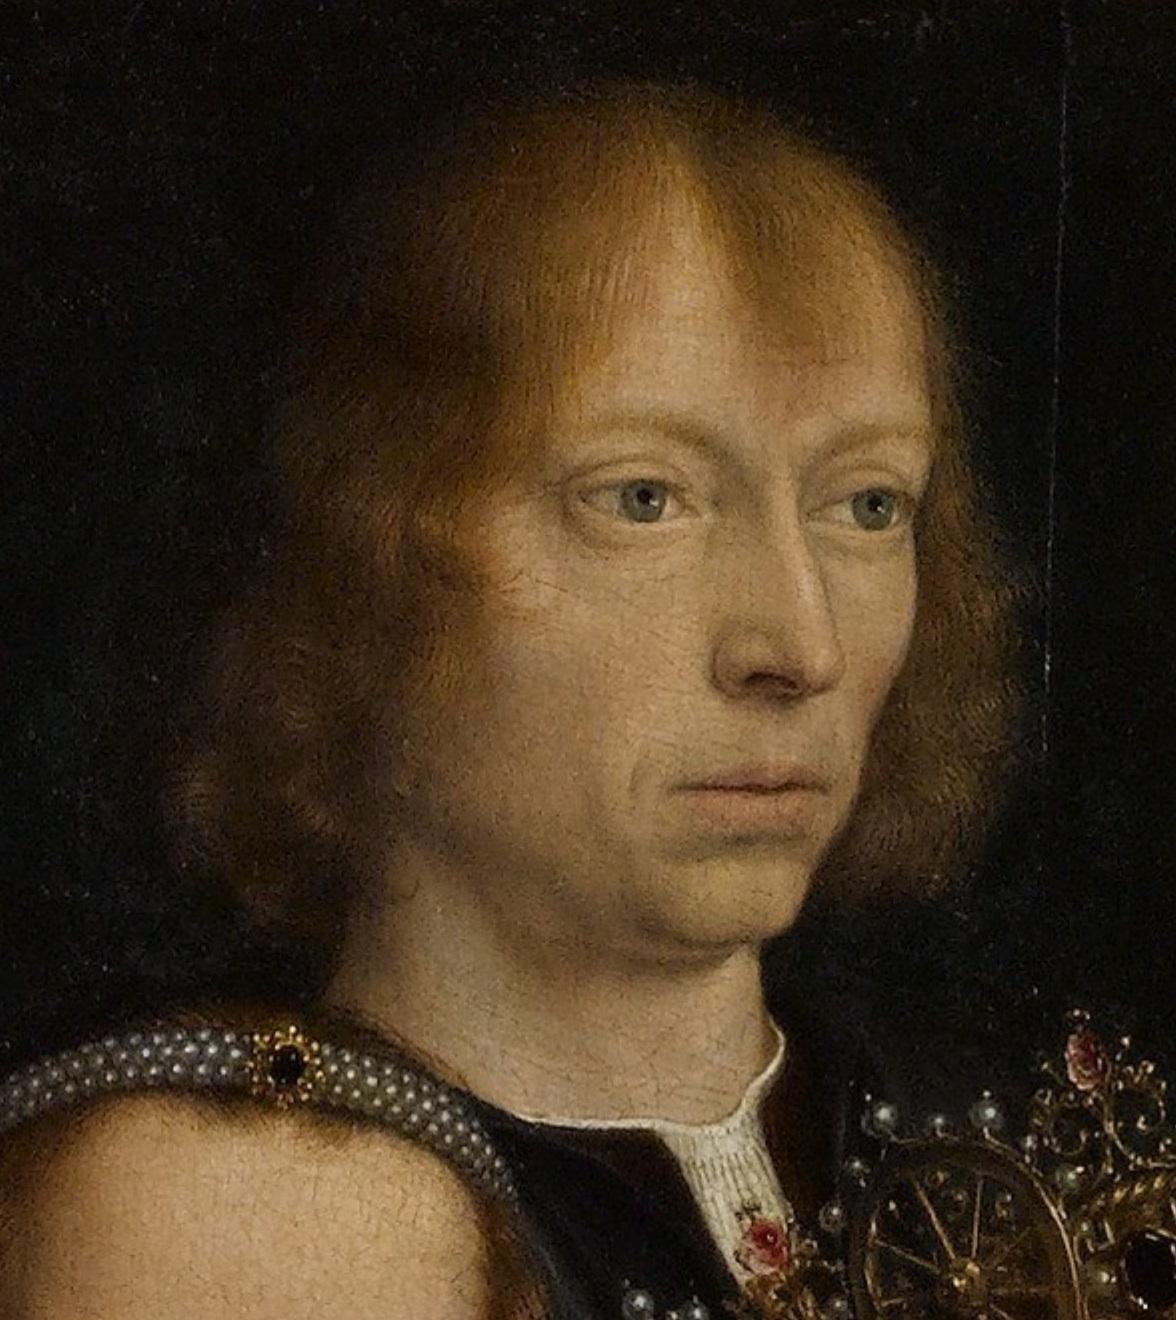 Sesselbezüge classical flemish renaissance on hans holbein jan eyck and albrecht durer